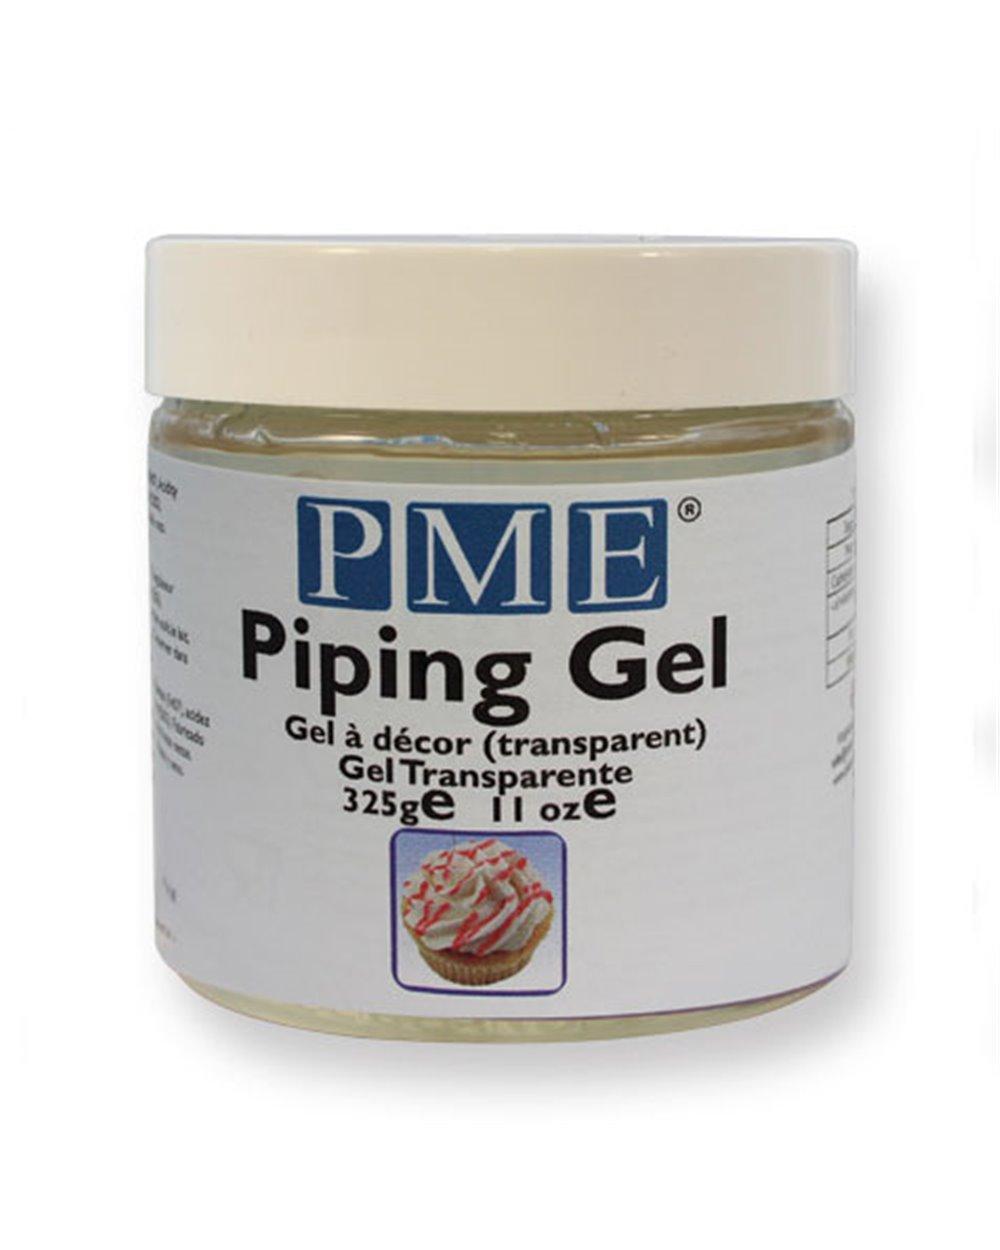 PME Piping Gel 325g+